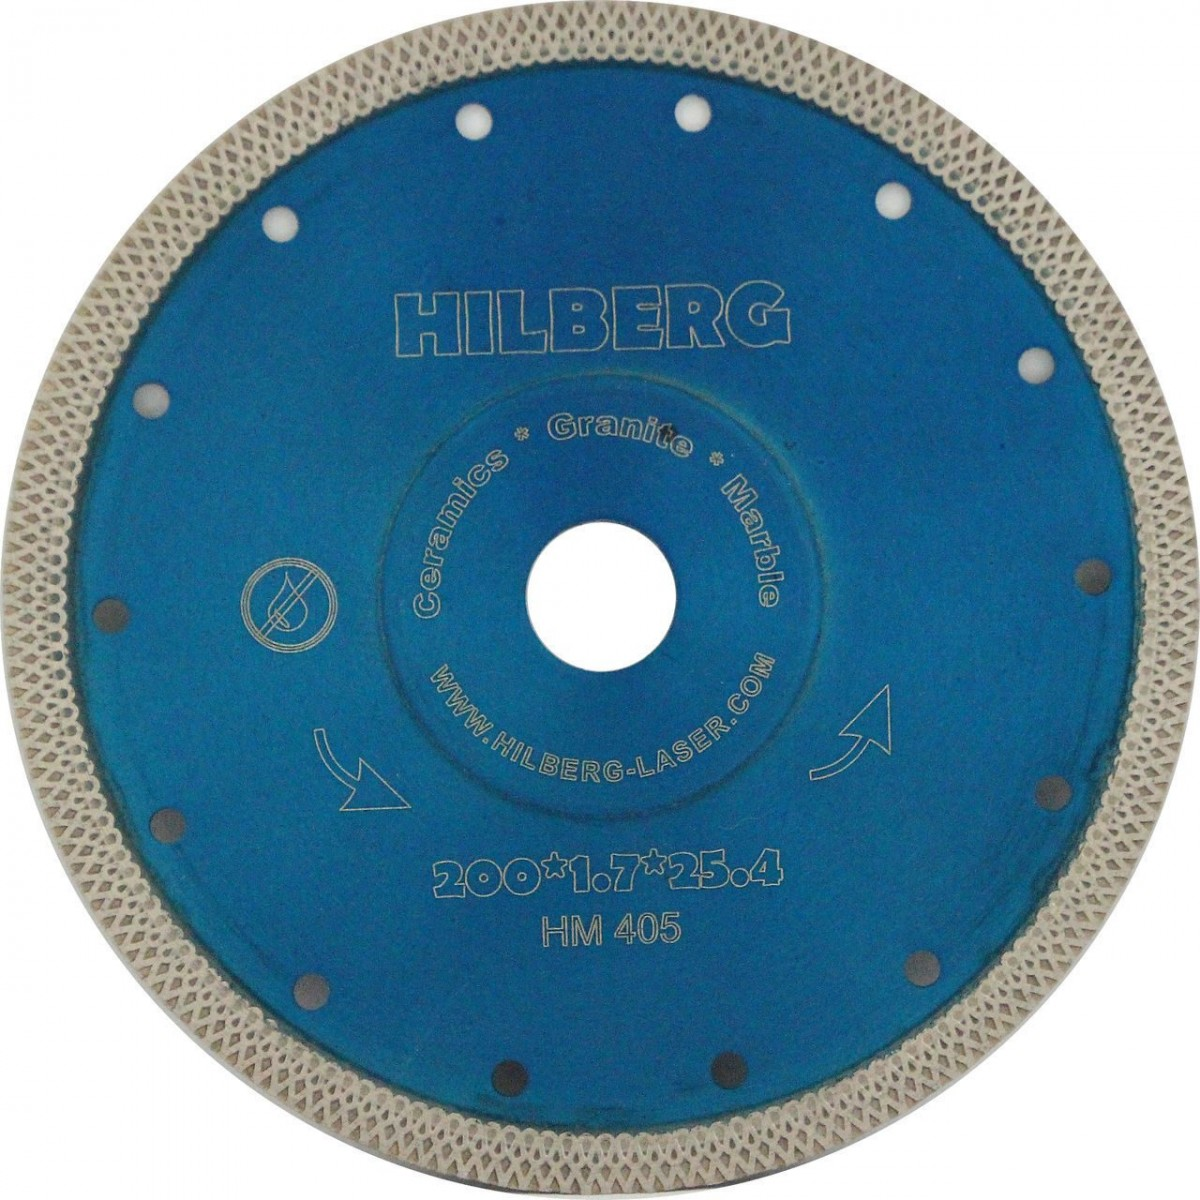 Диск алмазный Trio Diamond 200*25,4/22,22,3 Hilberg Турбо ультратонкий х-тип